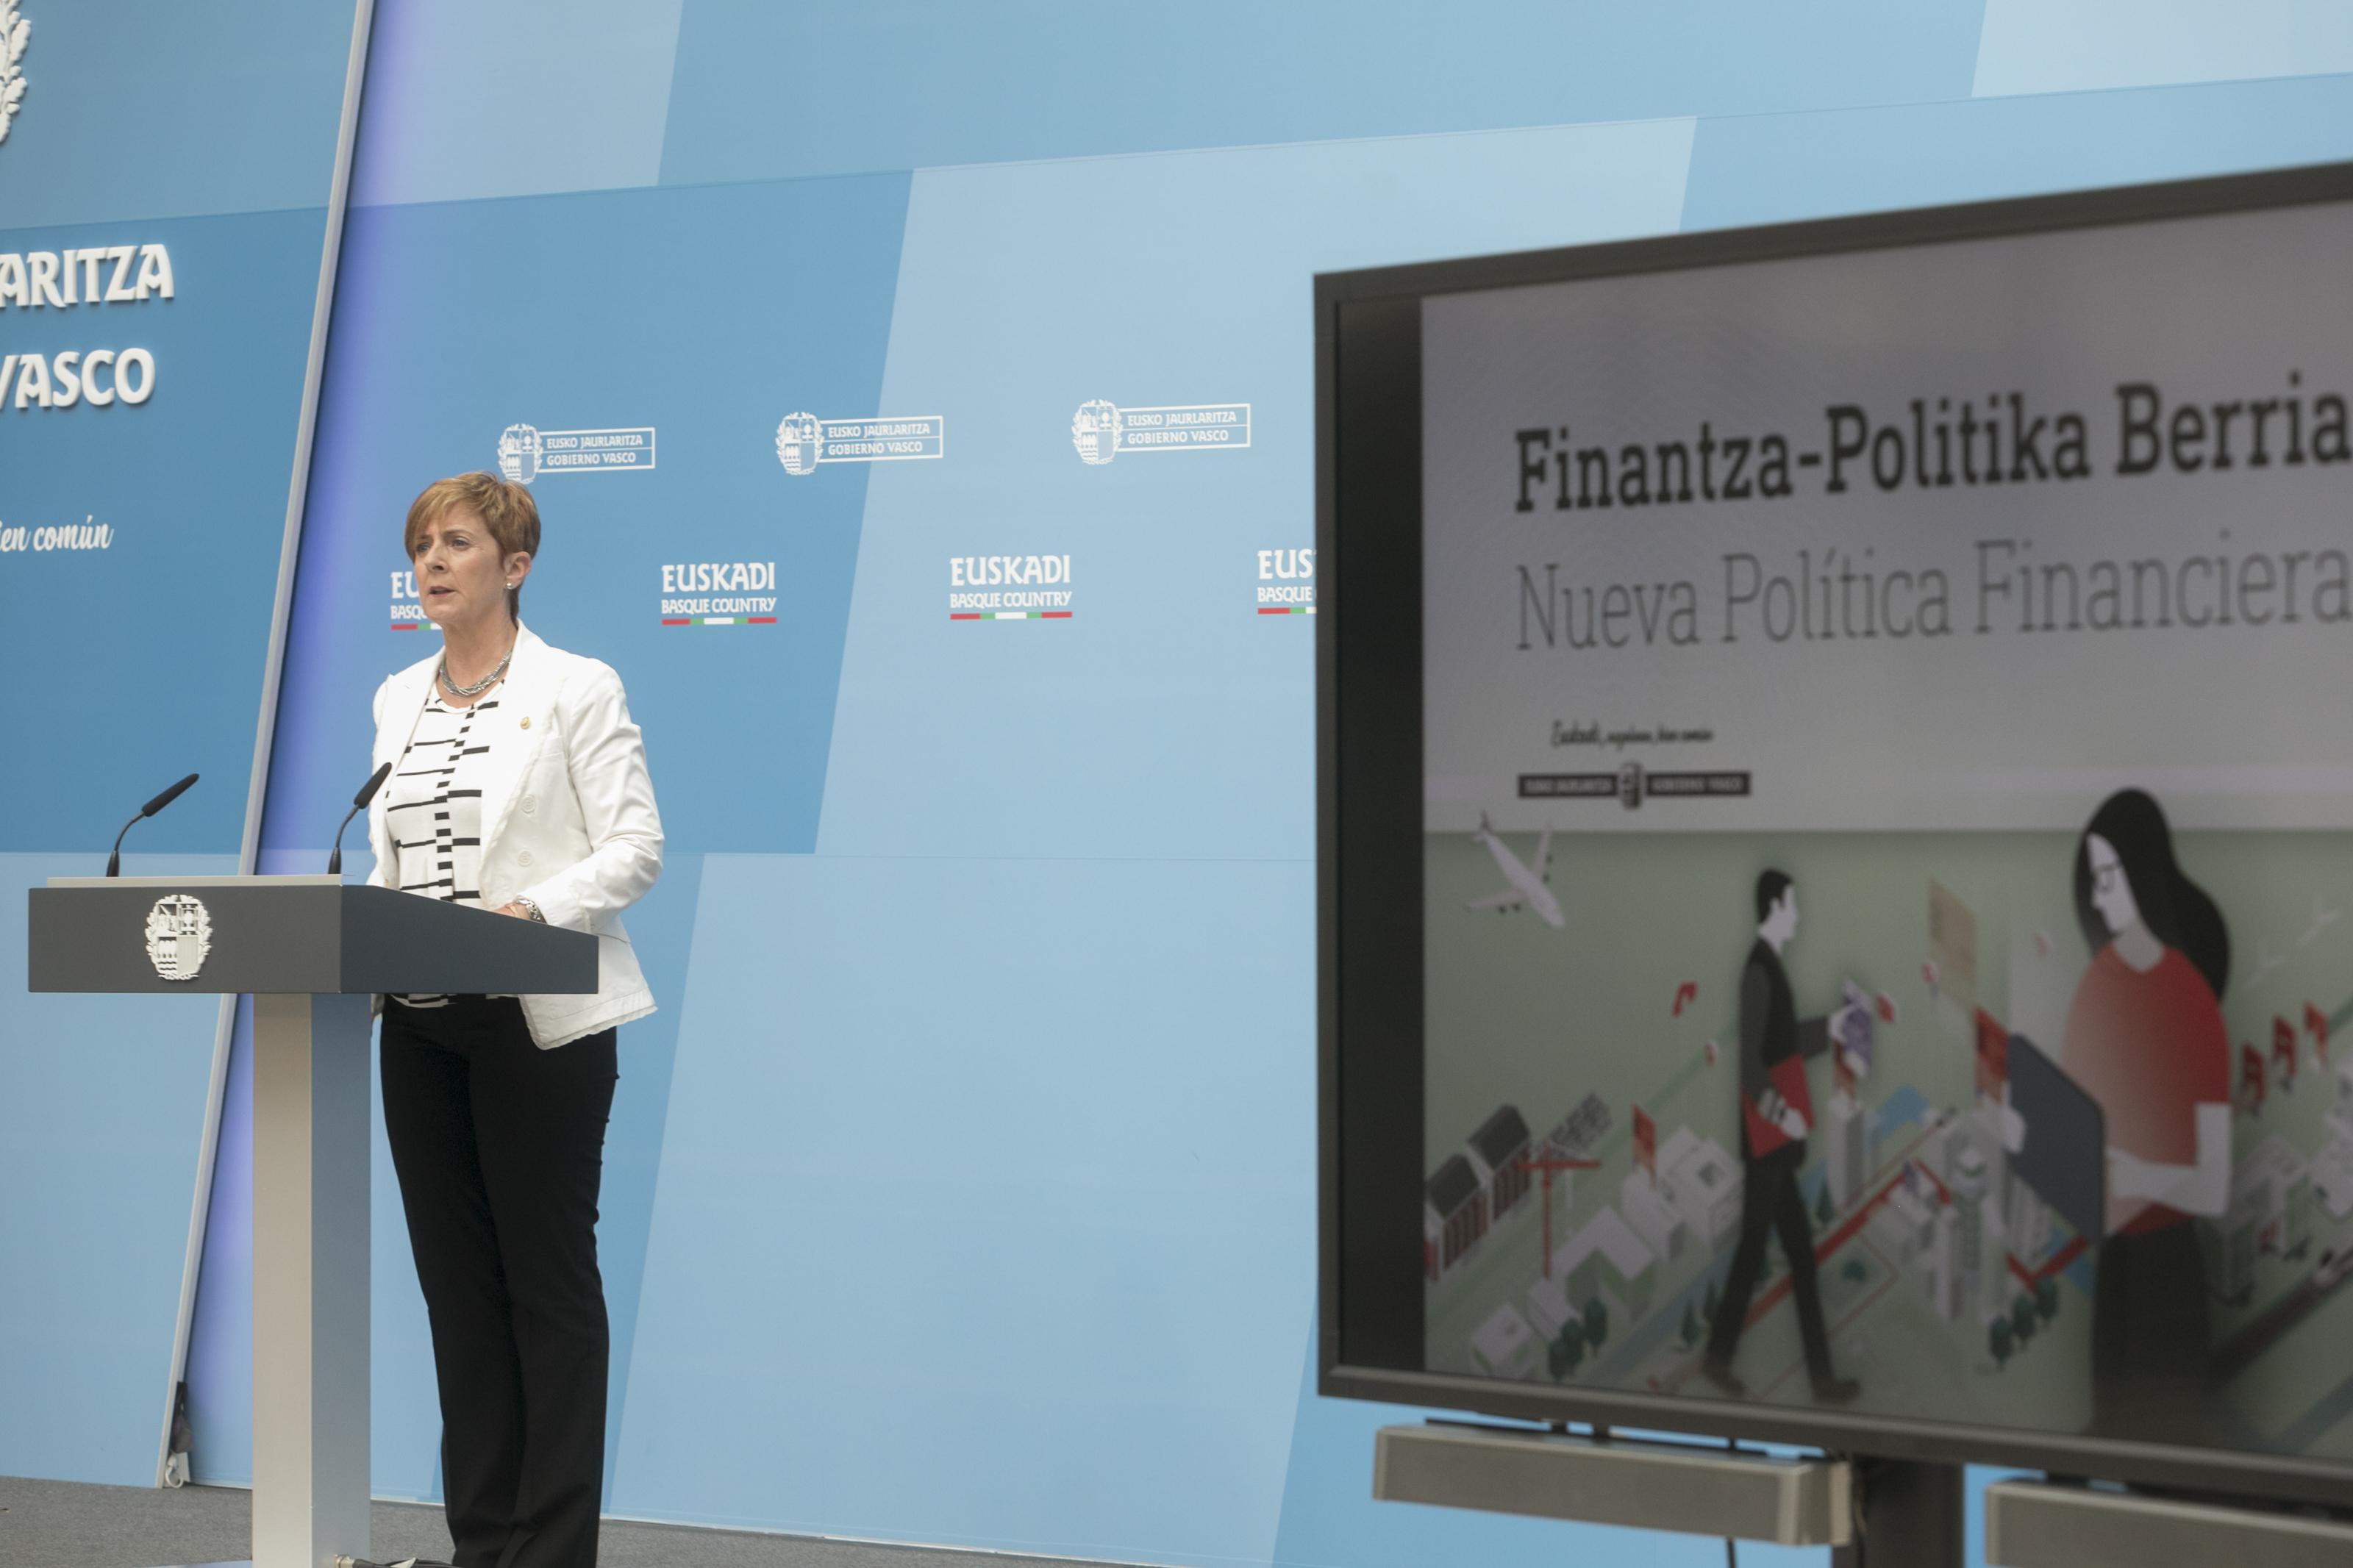 lhk_politica_financiera_04.jpg